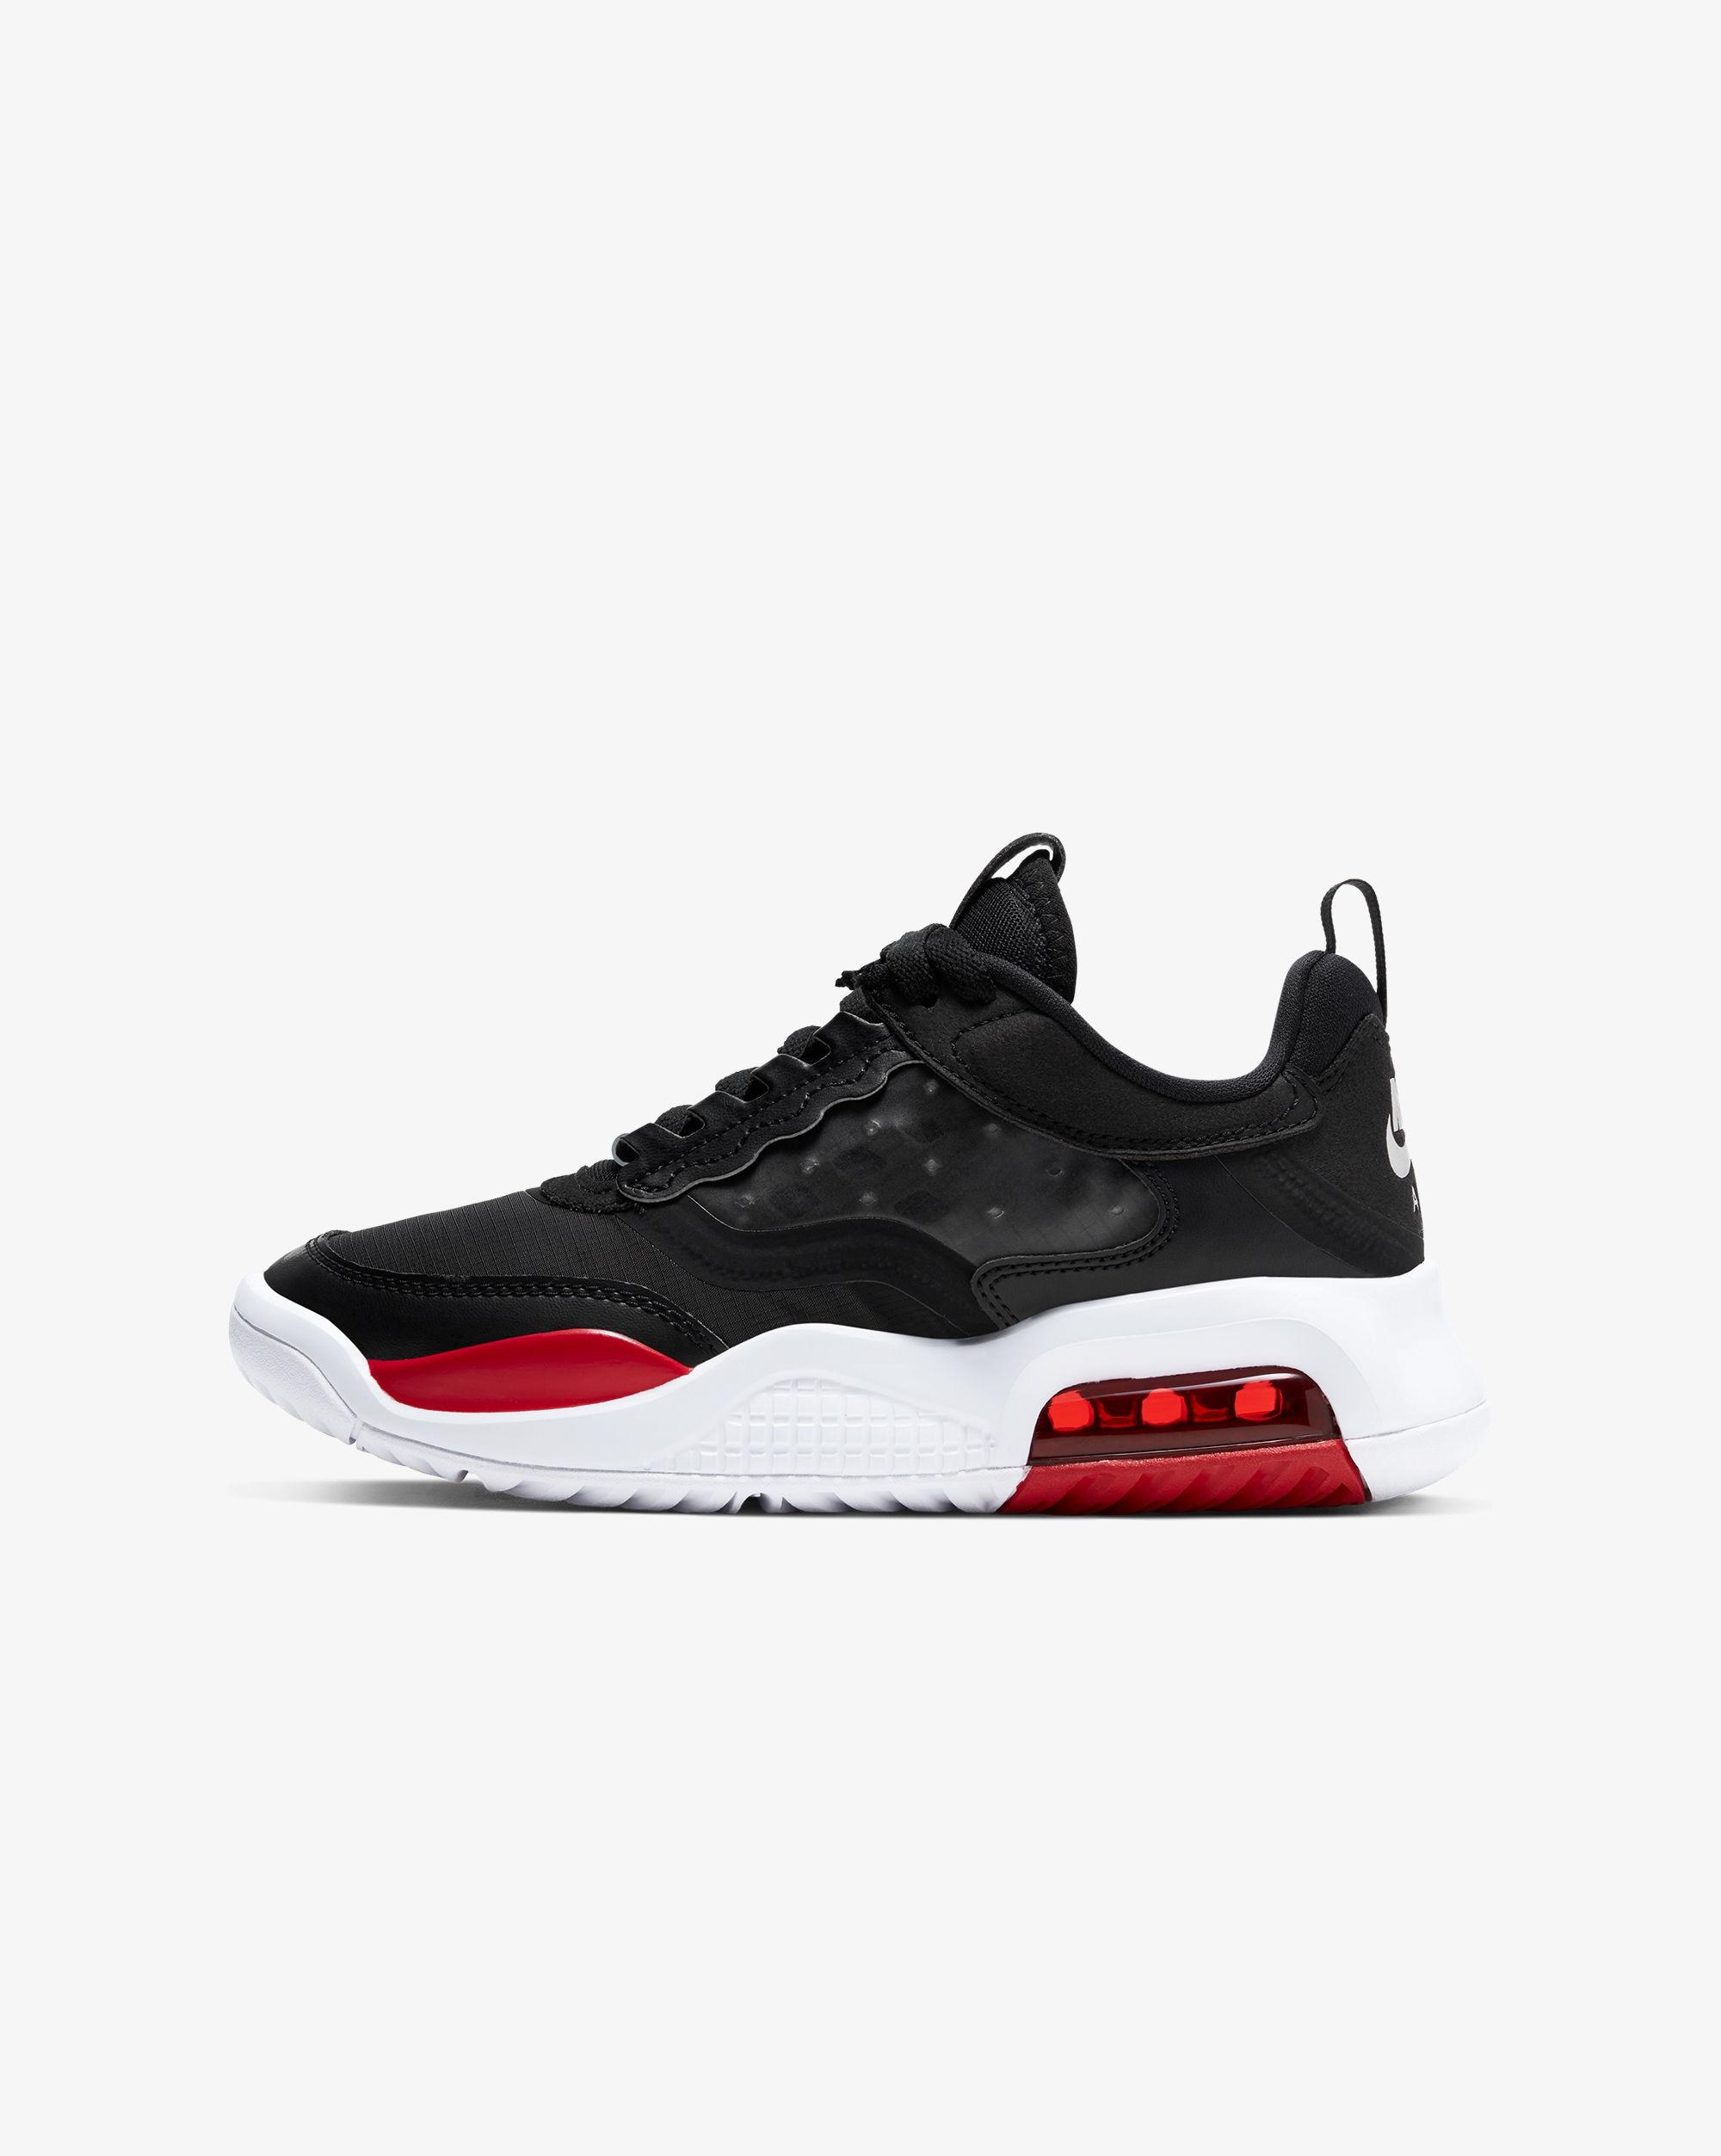 Nike Jordan Air Max 200 Bambino